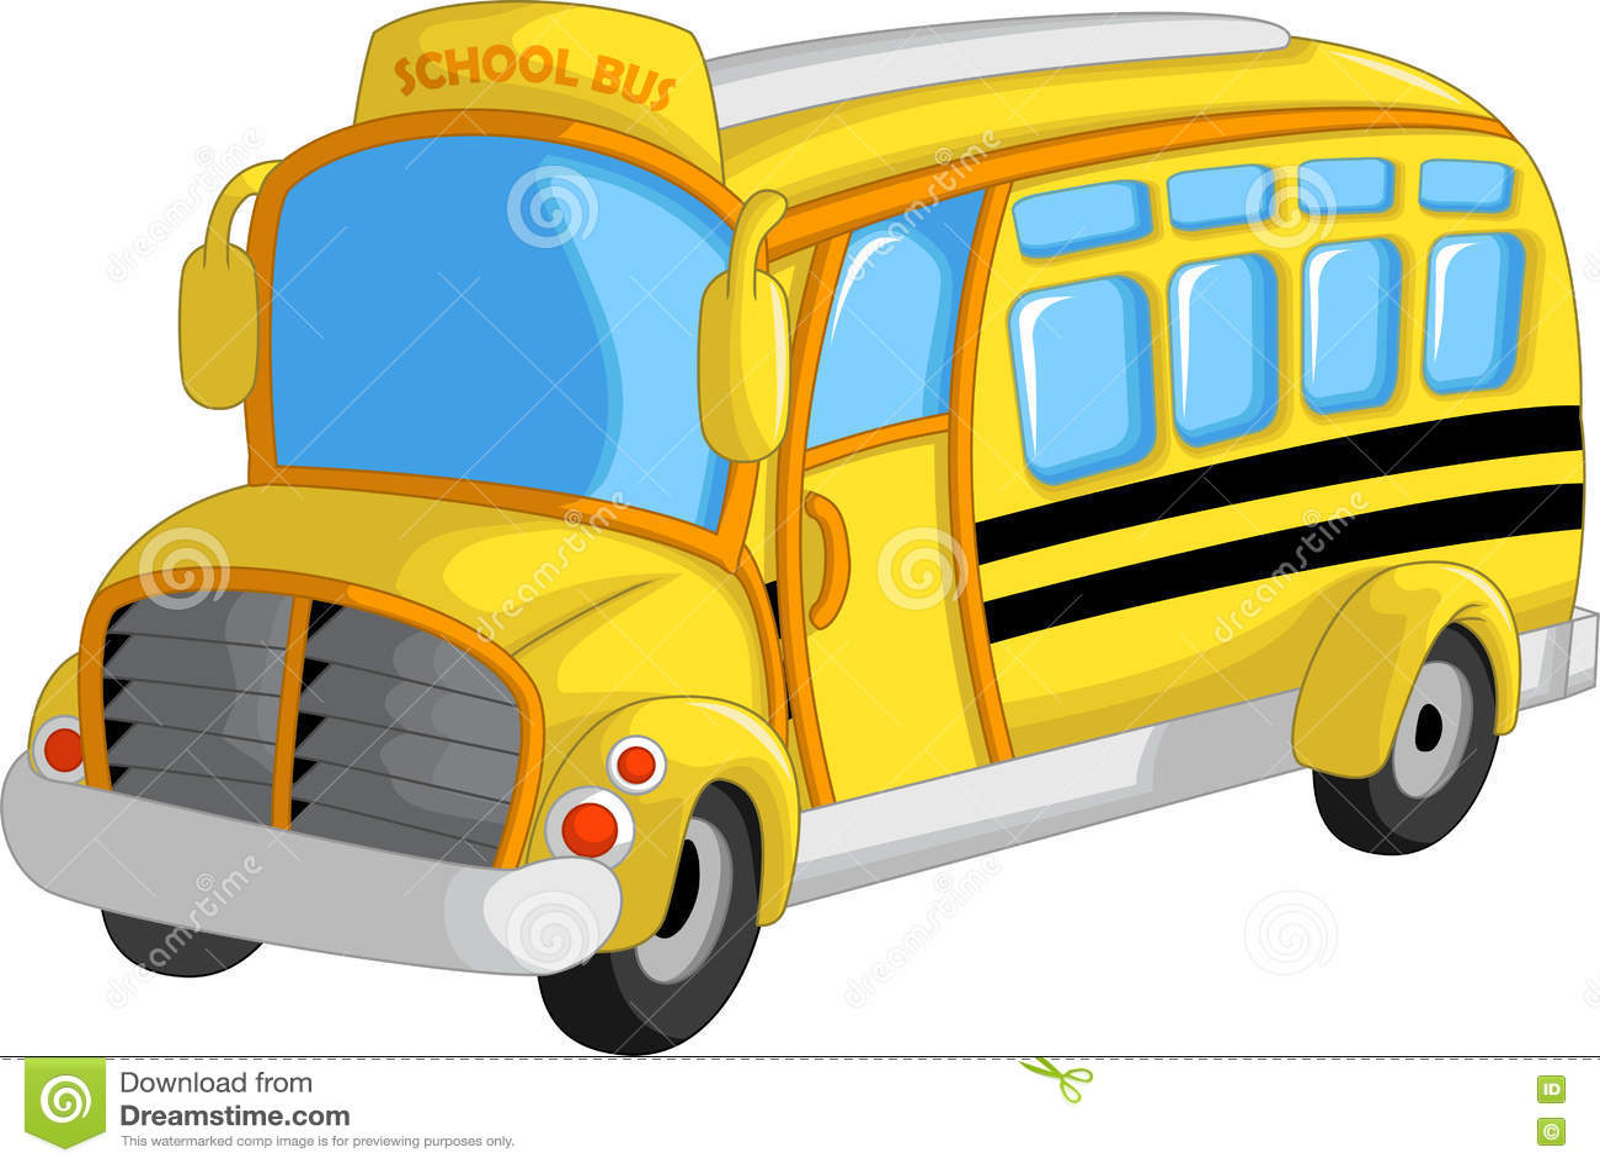 how to draw a school bus cartoon